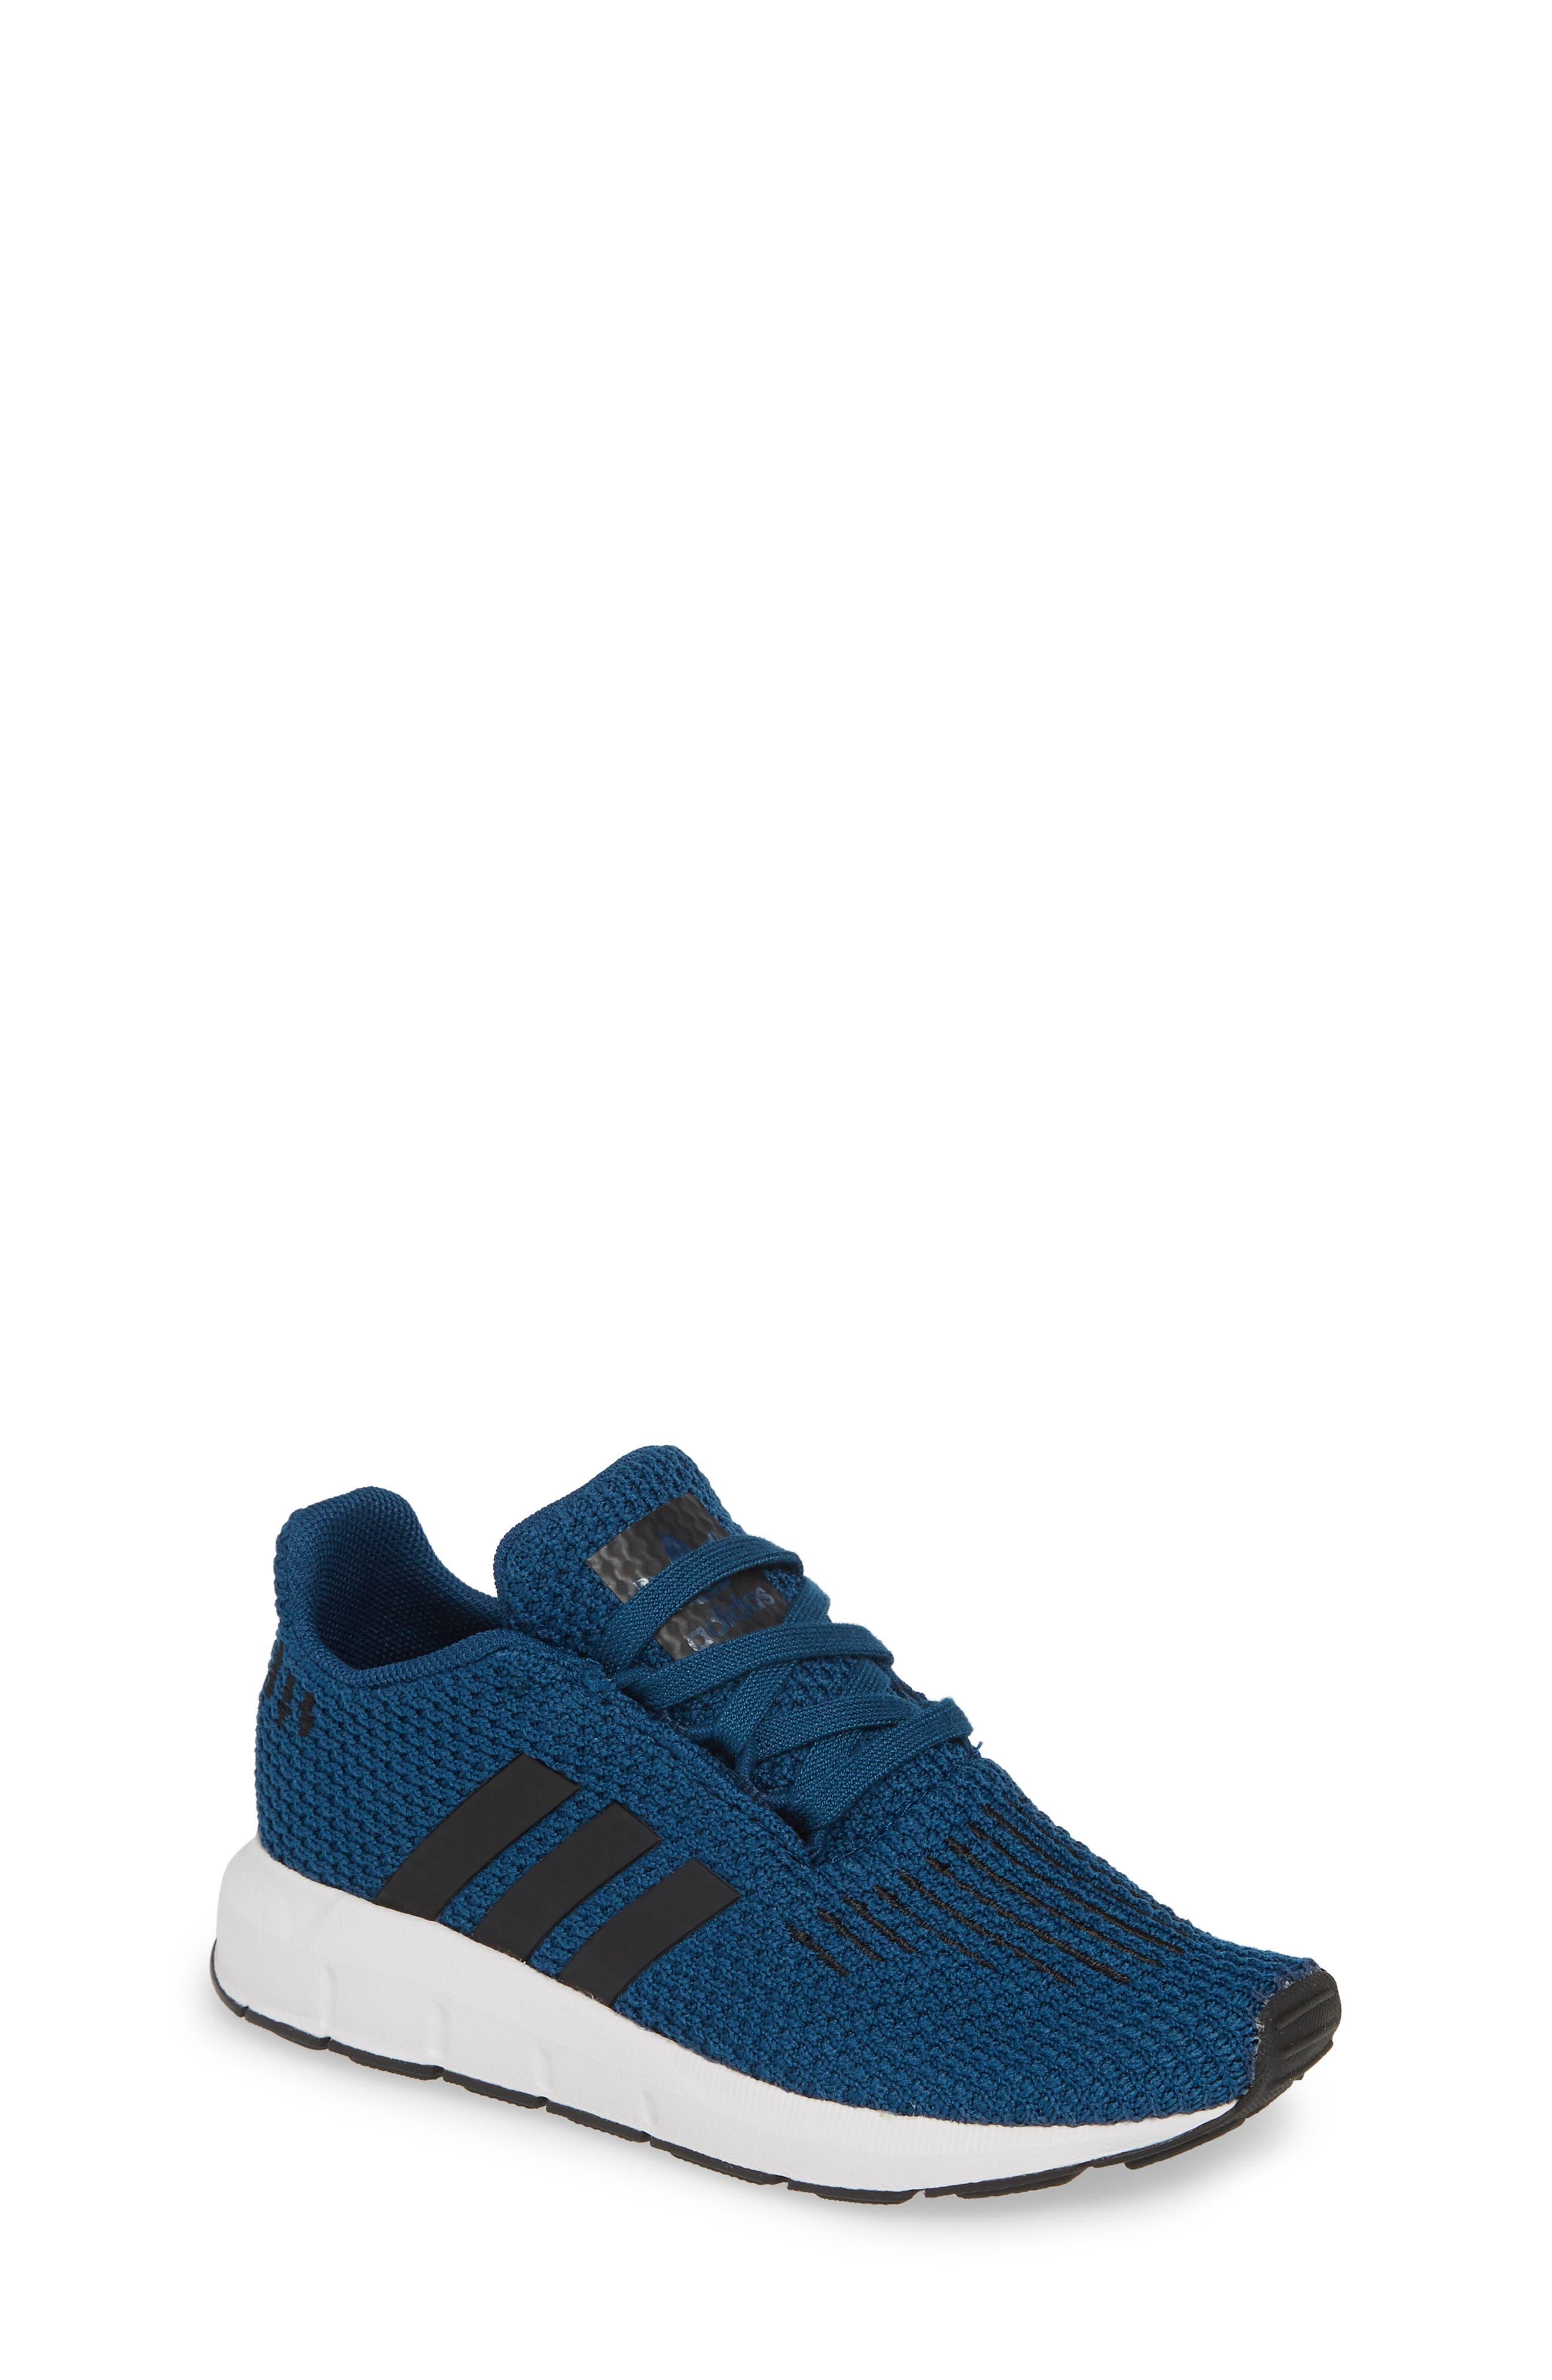 Toddler Adidas Swift Run J Sneaker Size 115 M  Blue